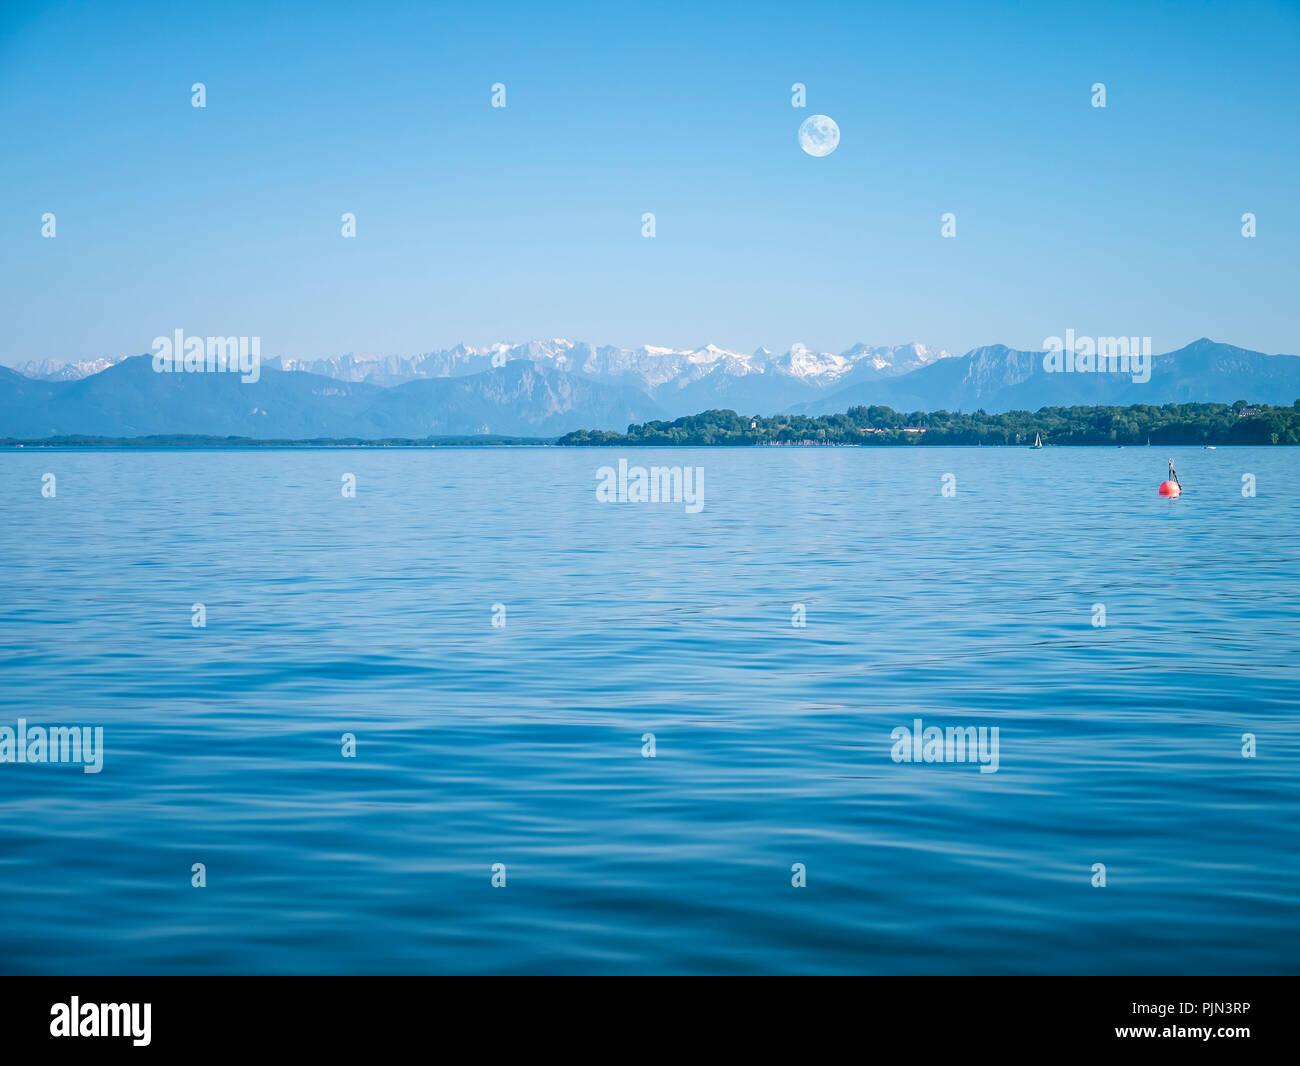 The nice Alps under the full moon with look at the Starnberger lake, Die schoenen Alpen unter dem Vollmond mit Blick auf den Starnberger See - Stock Image